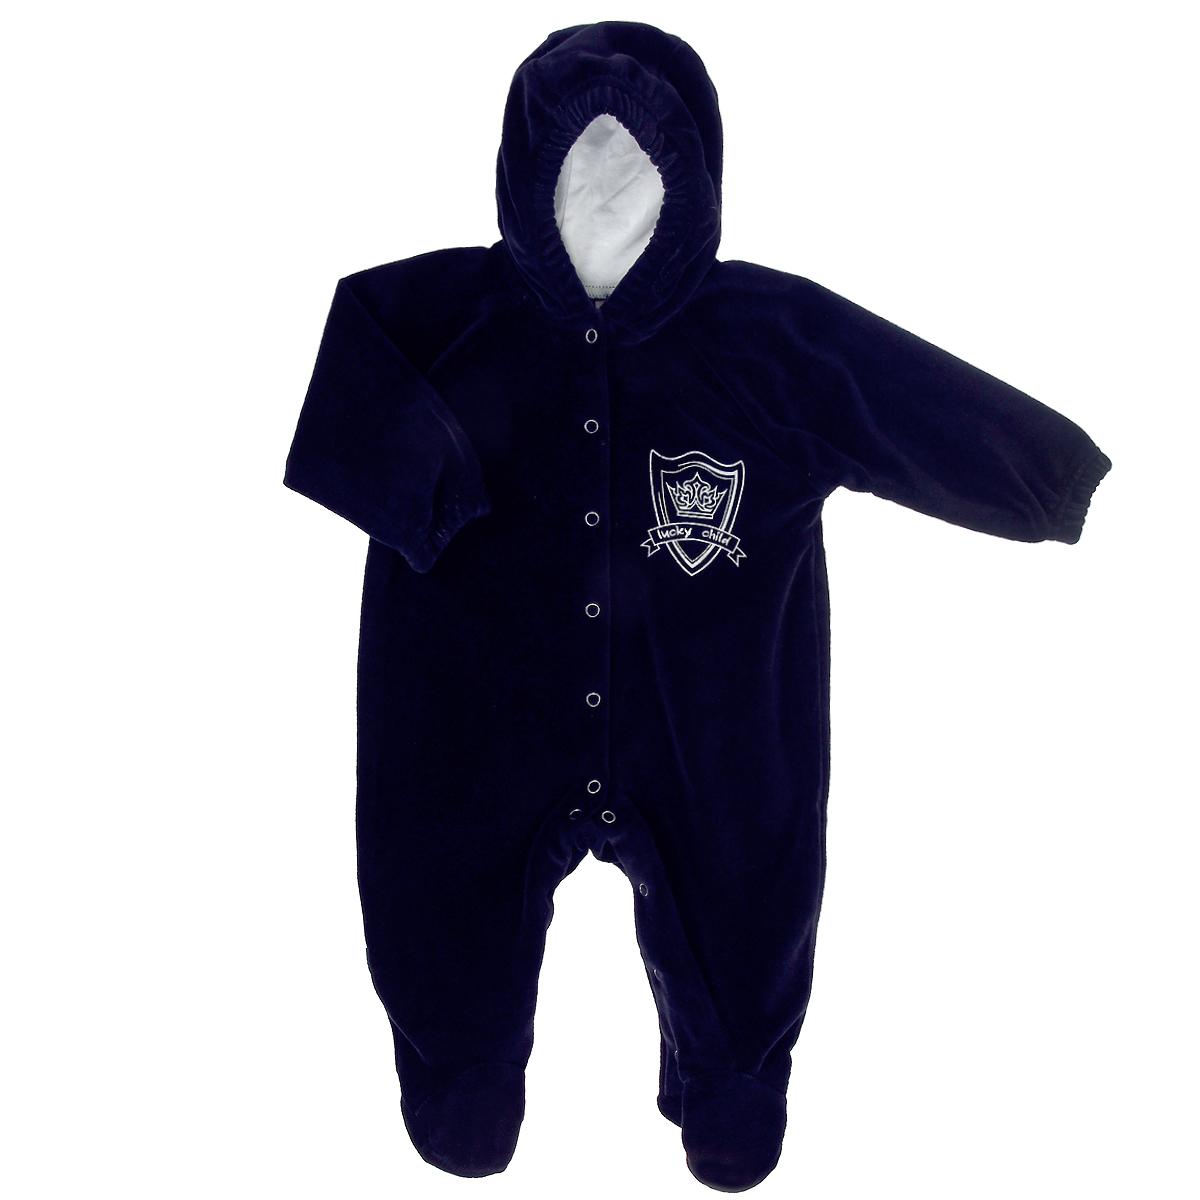 Комбинезон для мальчика Lucky Child, цвет: темно-синий. 3-21. Размер 62/68